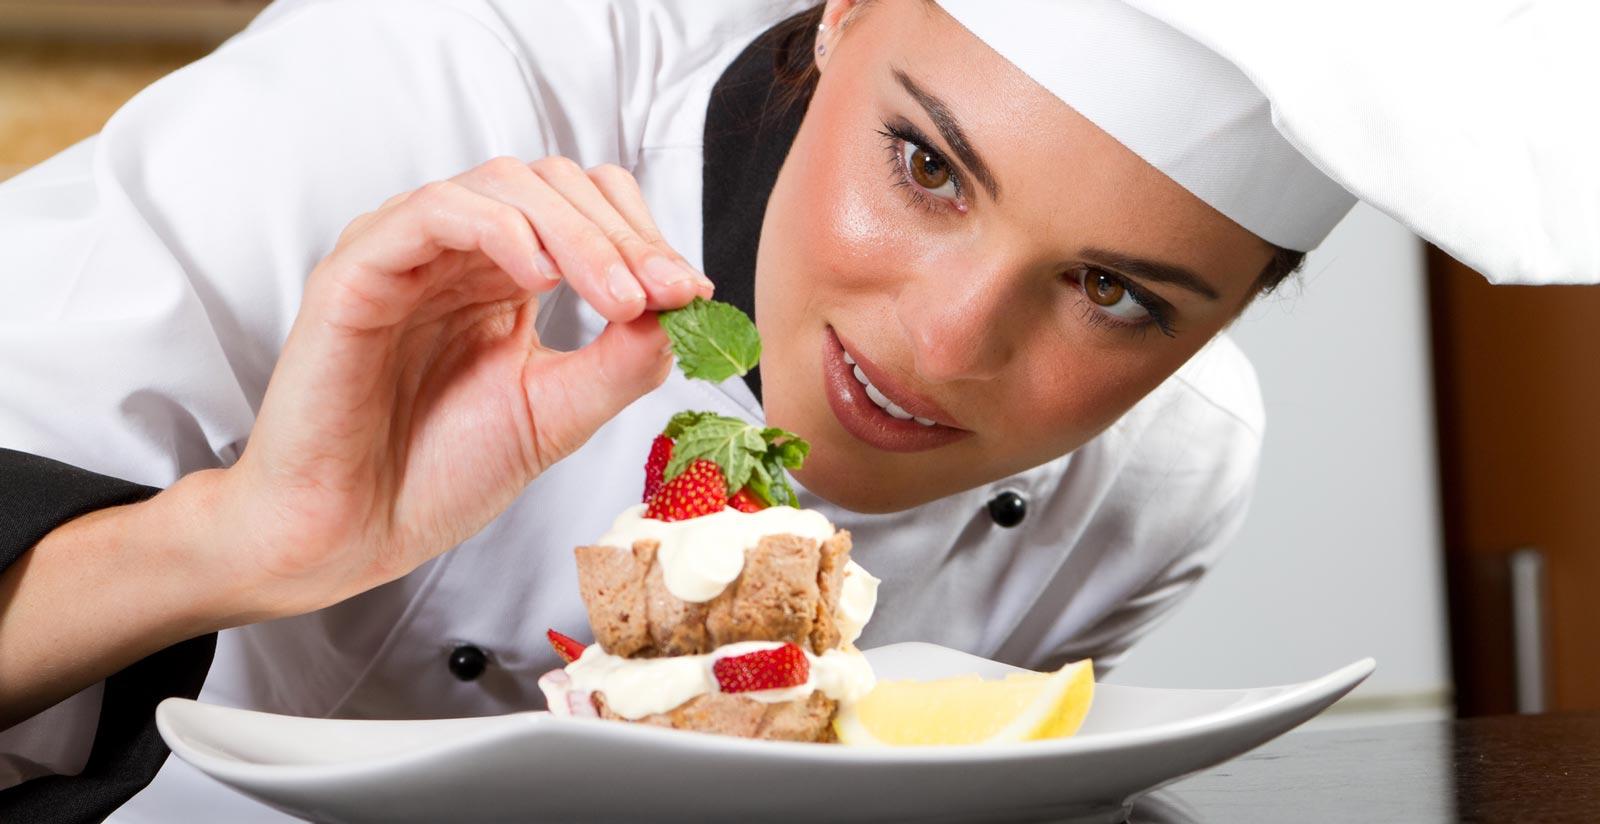 Corso cucina vegana milano beau simone salvini interior design ideas